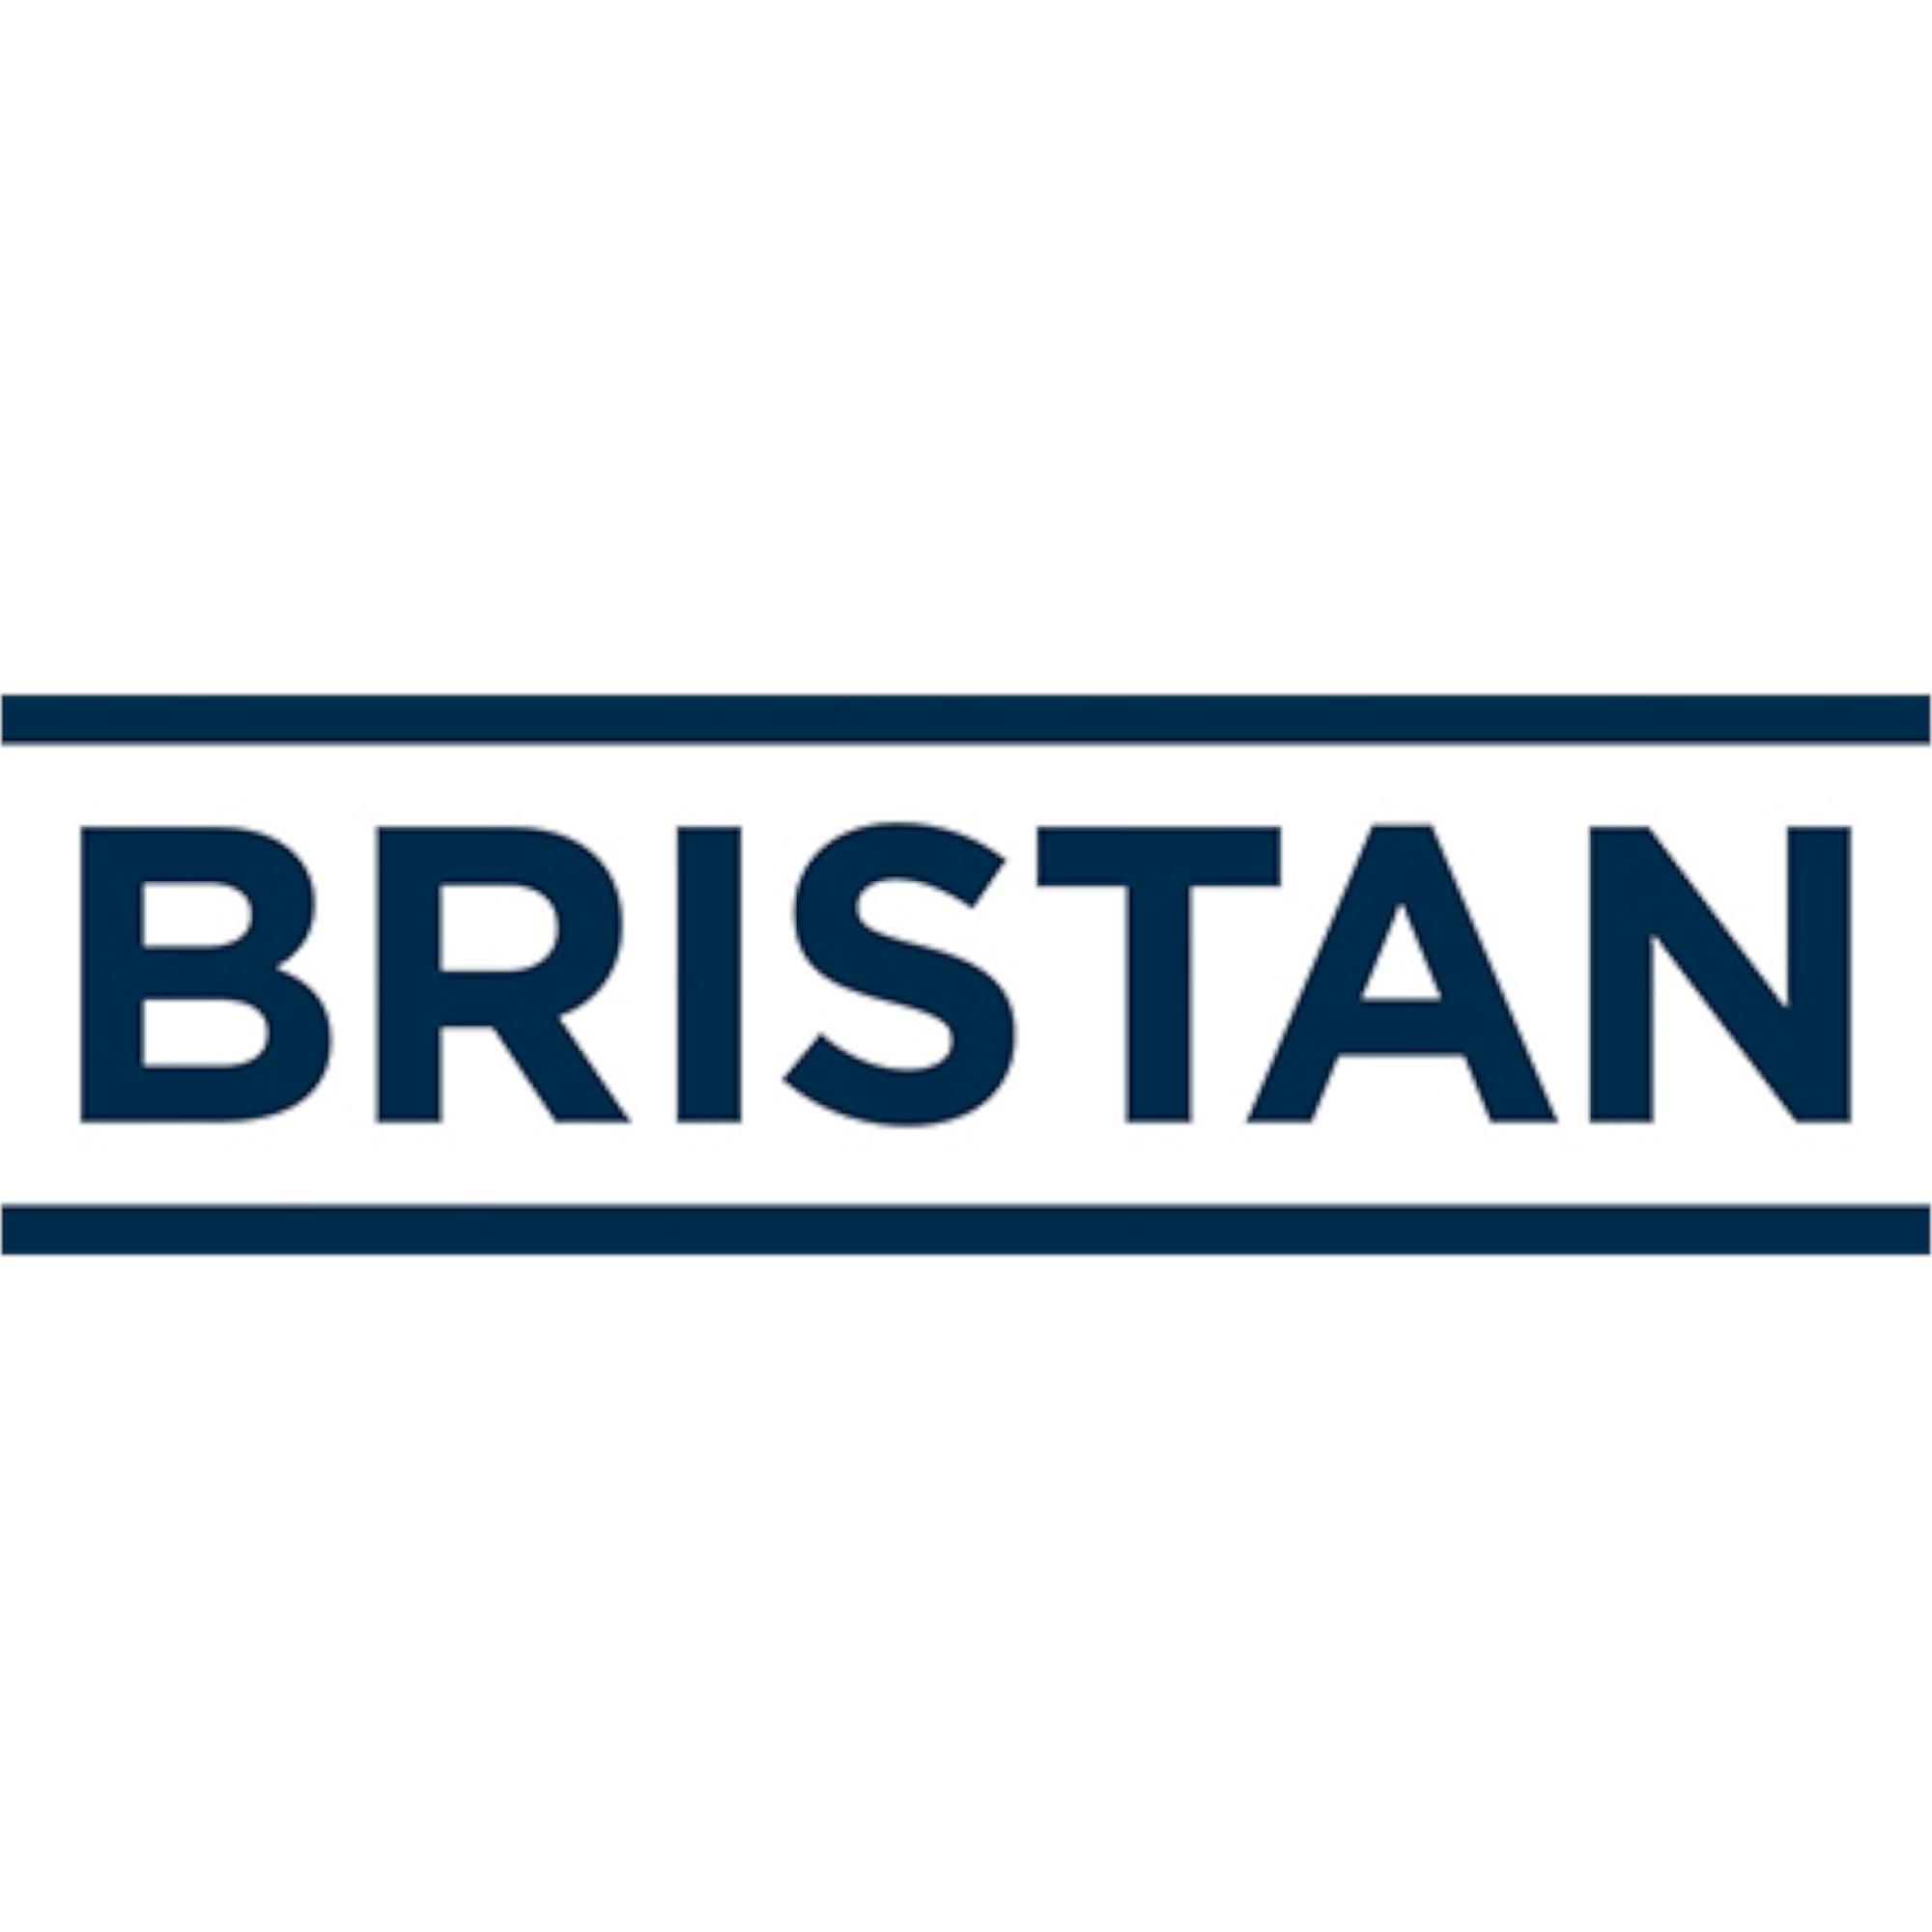 Bristan